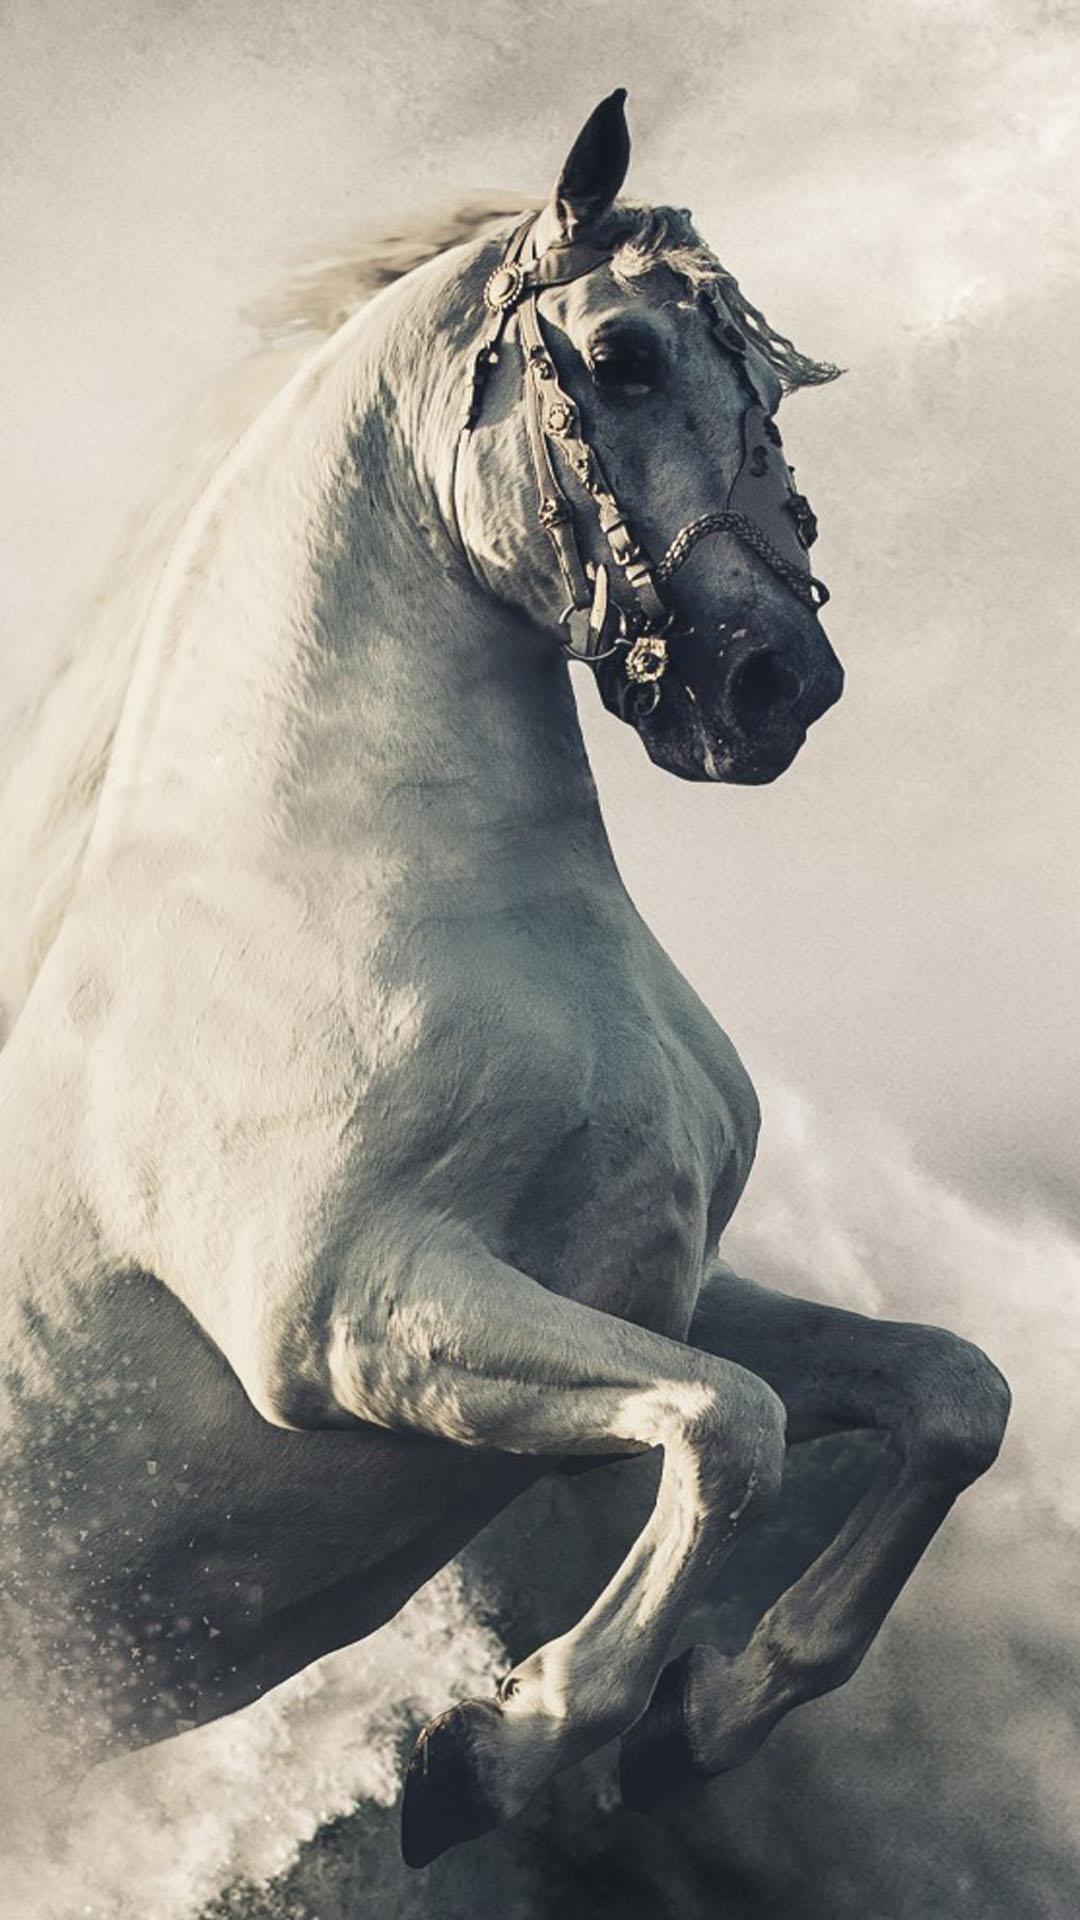 Download Pegasus White Horse Free Pure 4k Ultra Hd Mobile Wallpaper